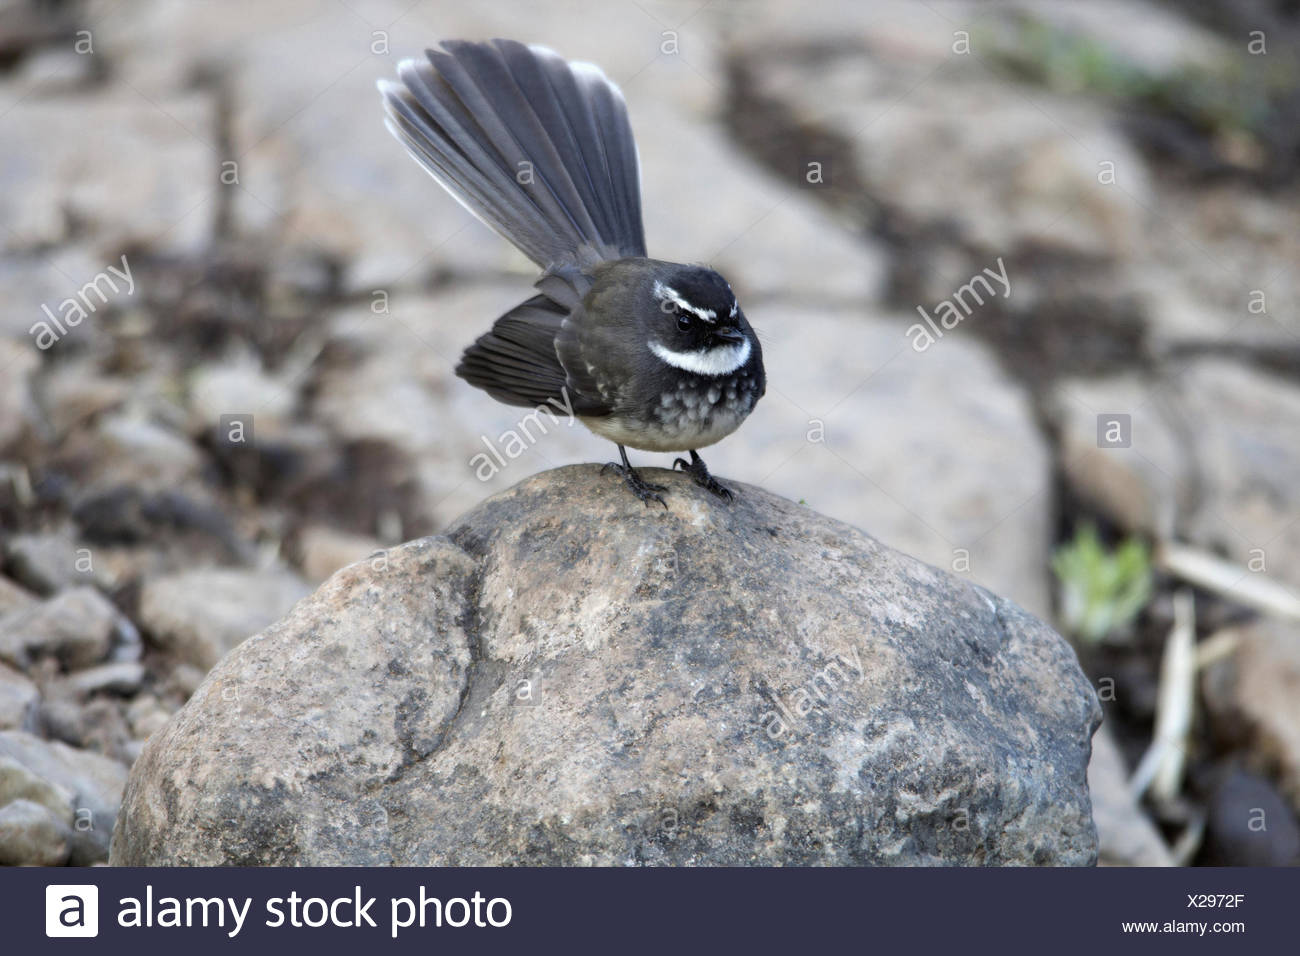 The white-throated fantail (Rhipidura albicollis) is a small passerine bird. - Stock Image